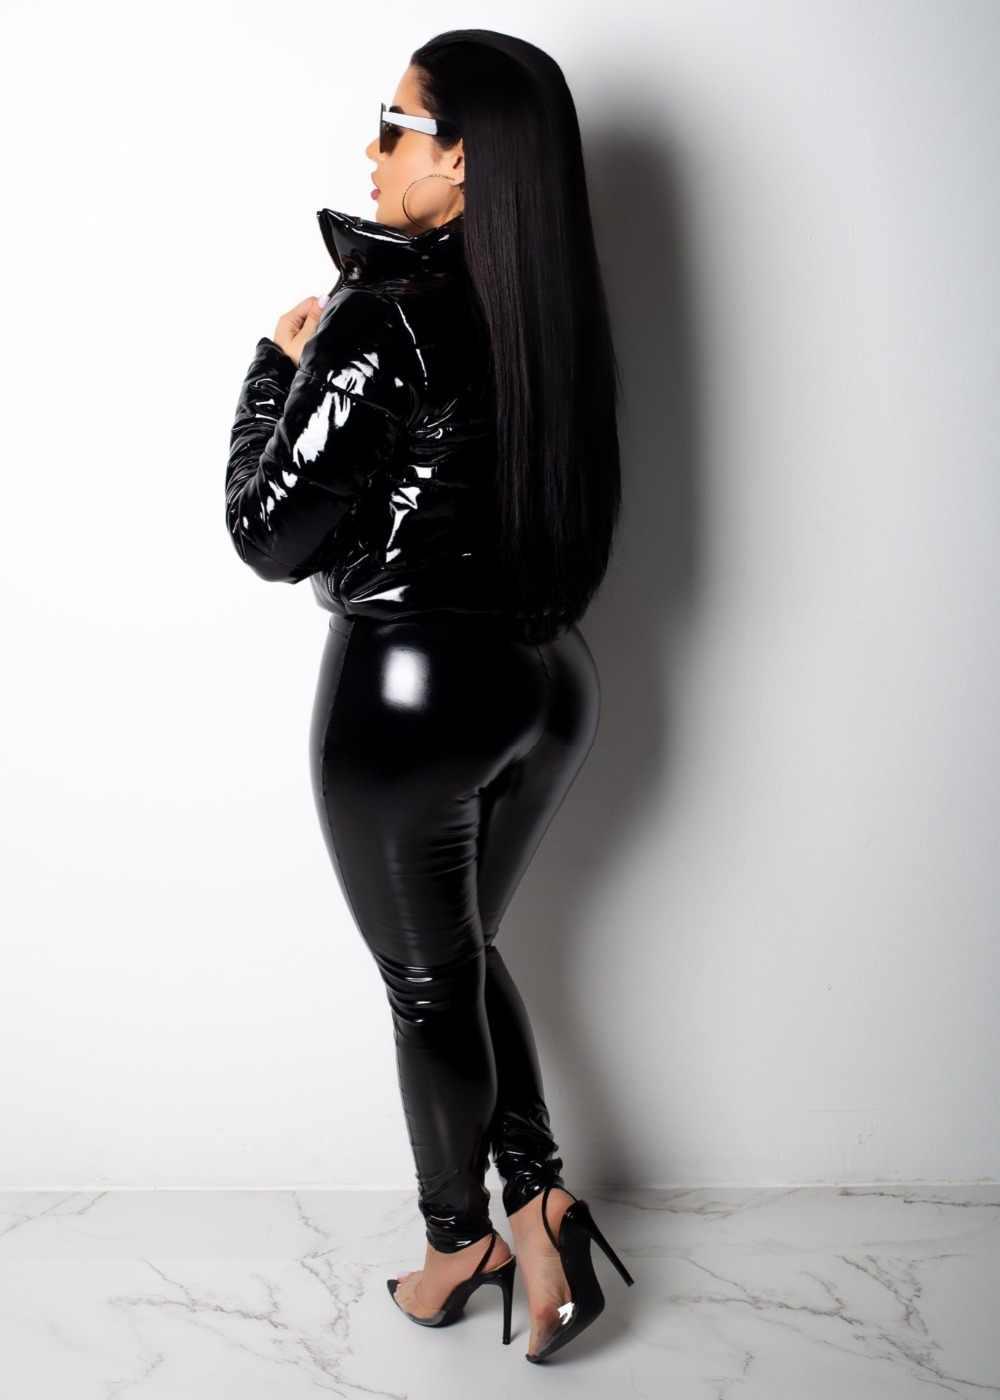 JRRY Sexy Velvet PU Leather Coats Jackets Cotton Fake Leather Women Jacket Zippers Turn Down Collar Overcoat Plus Size XXXL